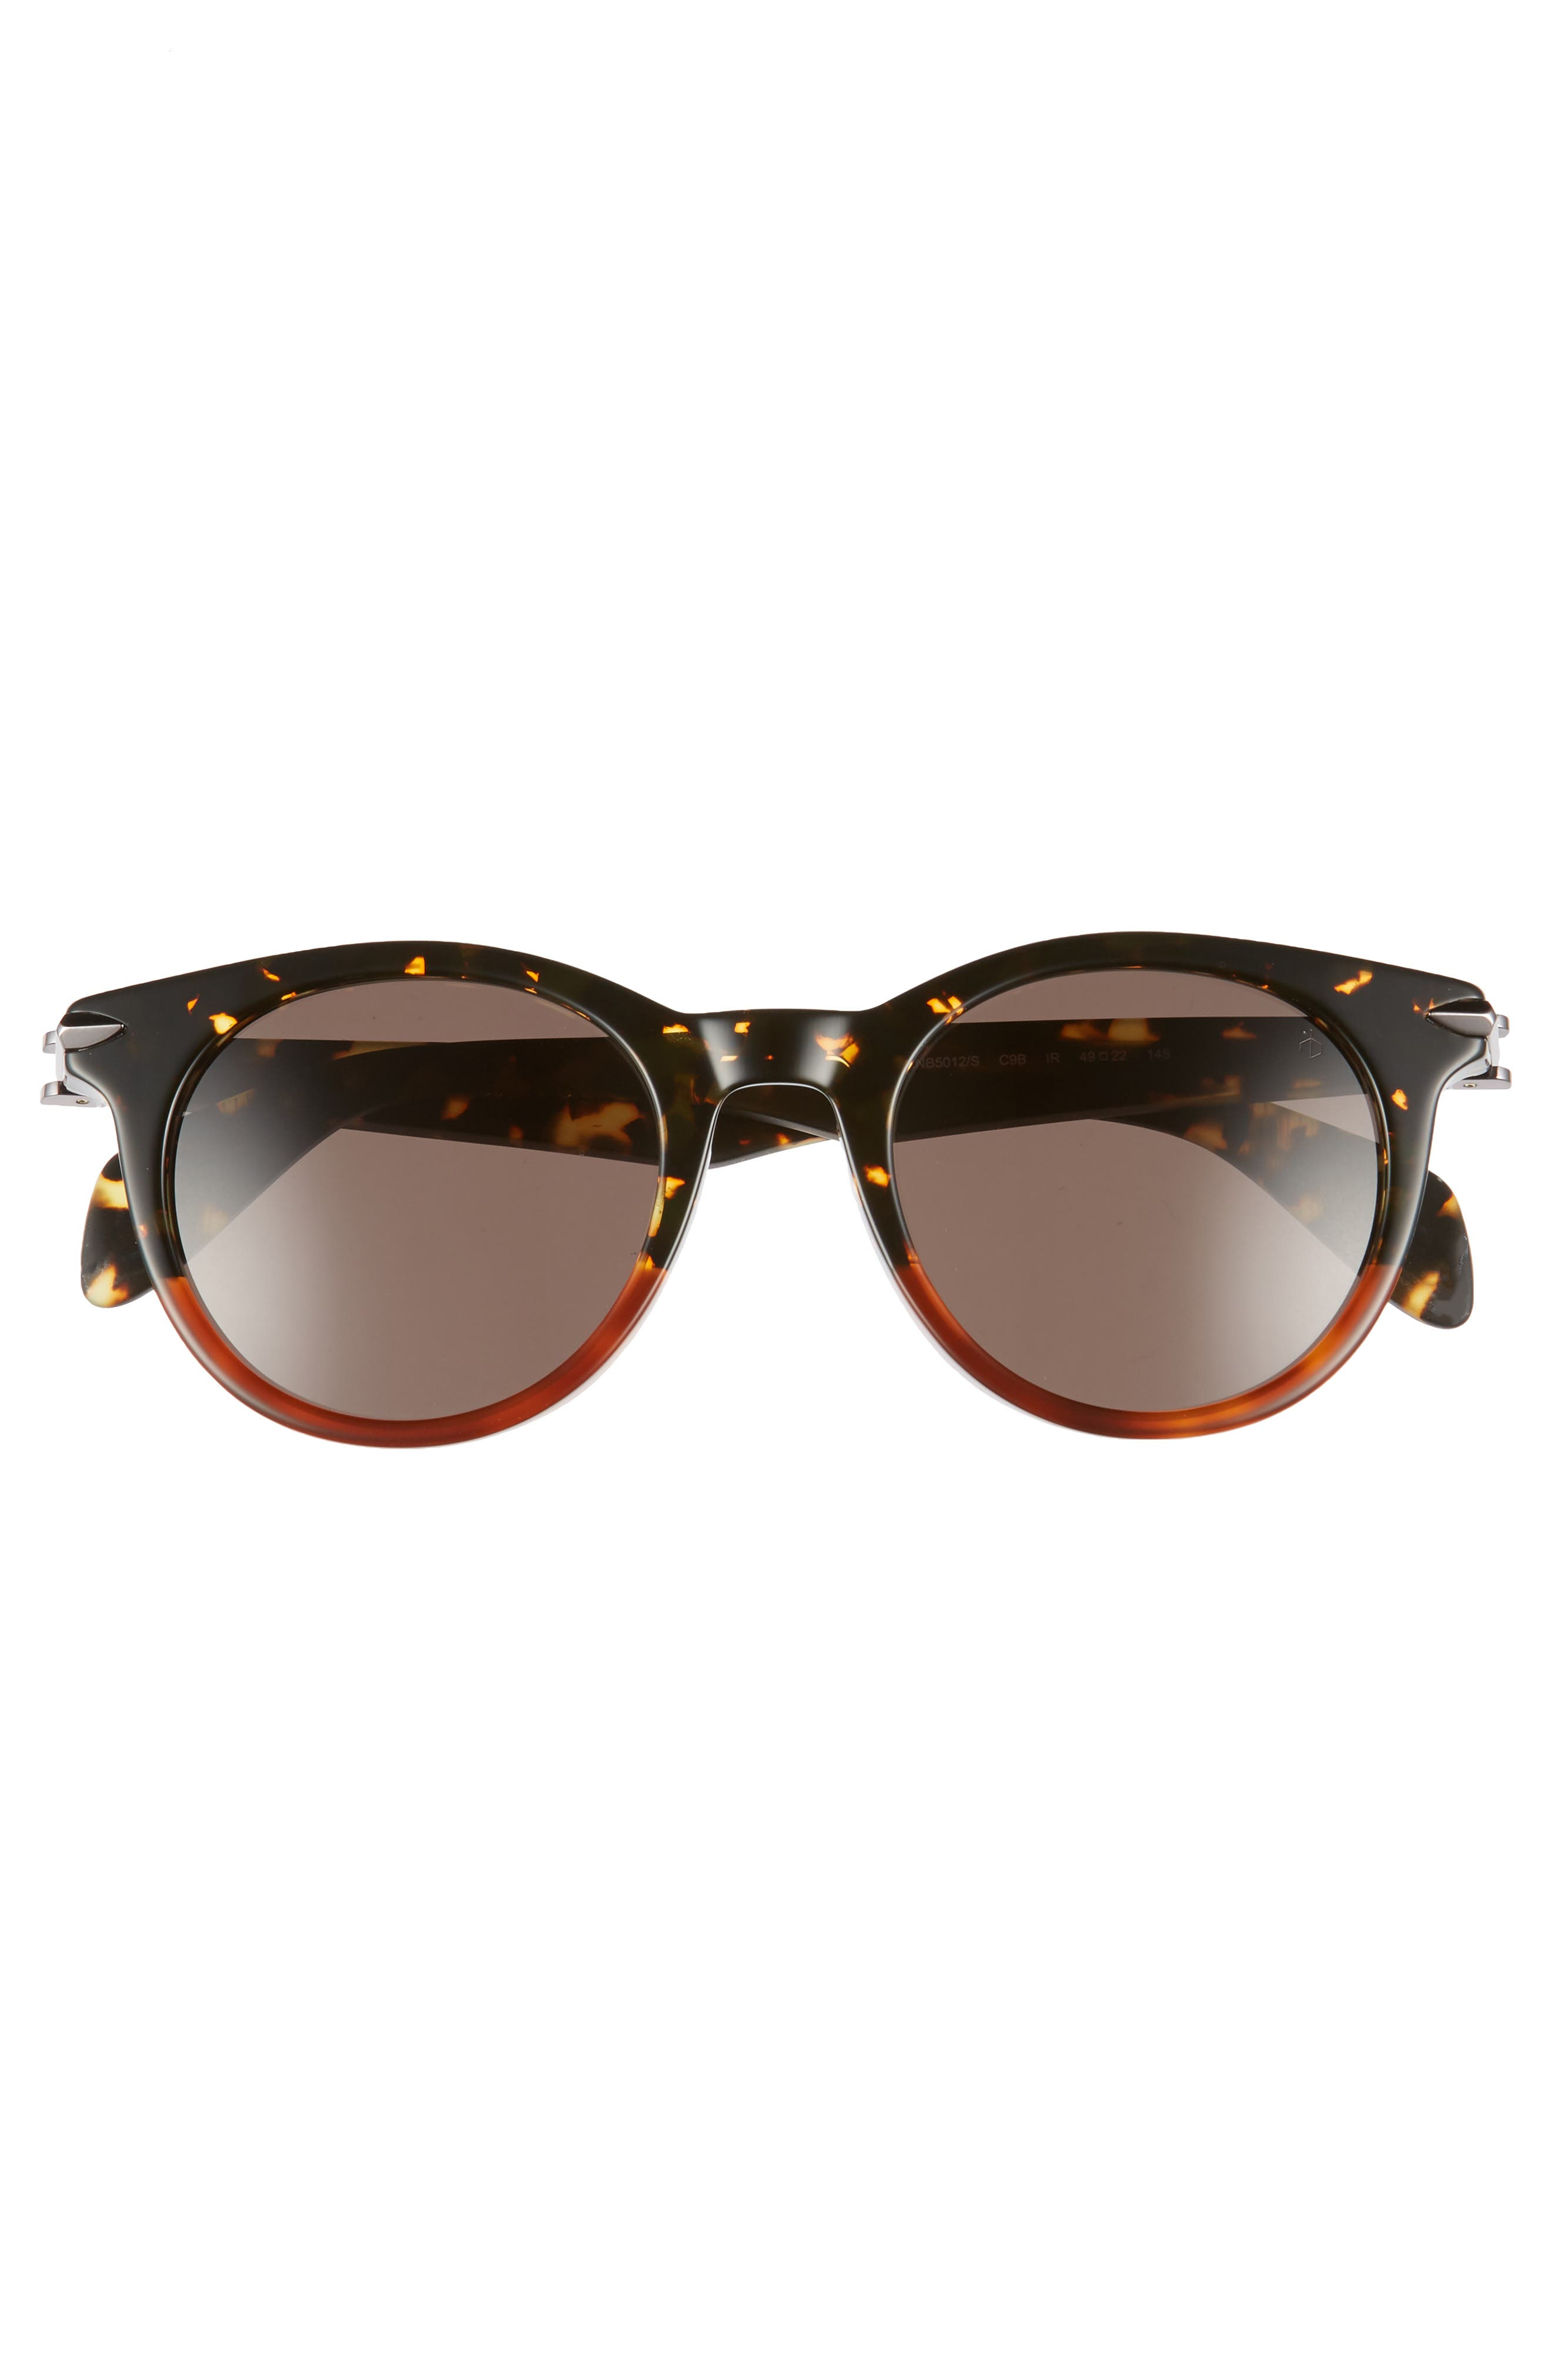 49mm Round Sunglasses,                             Alternate thumbnail 3, color,                             BLACK/ HAVANA HONEY